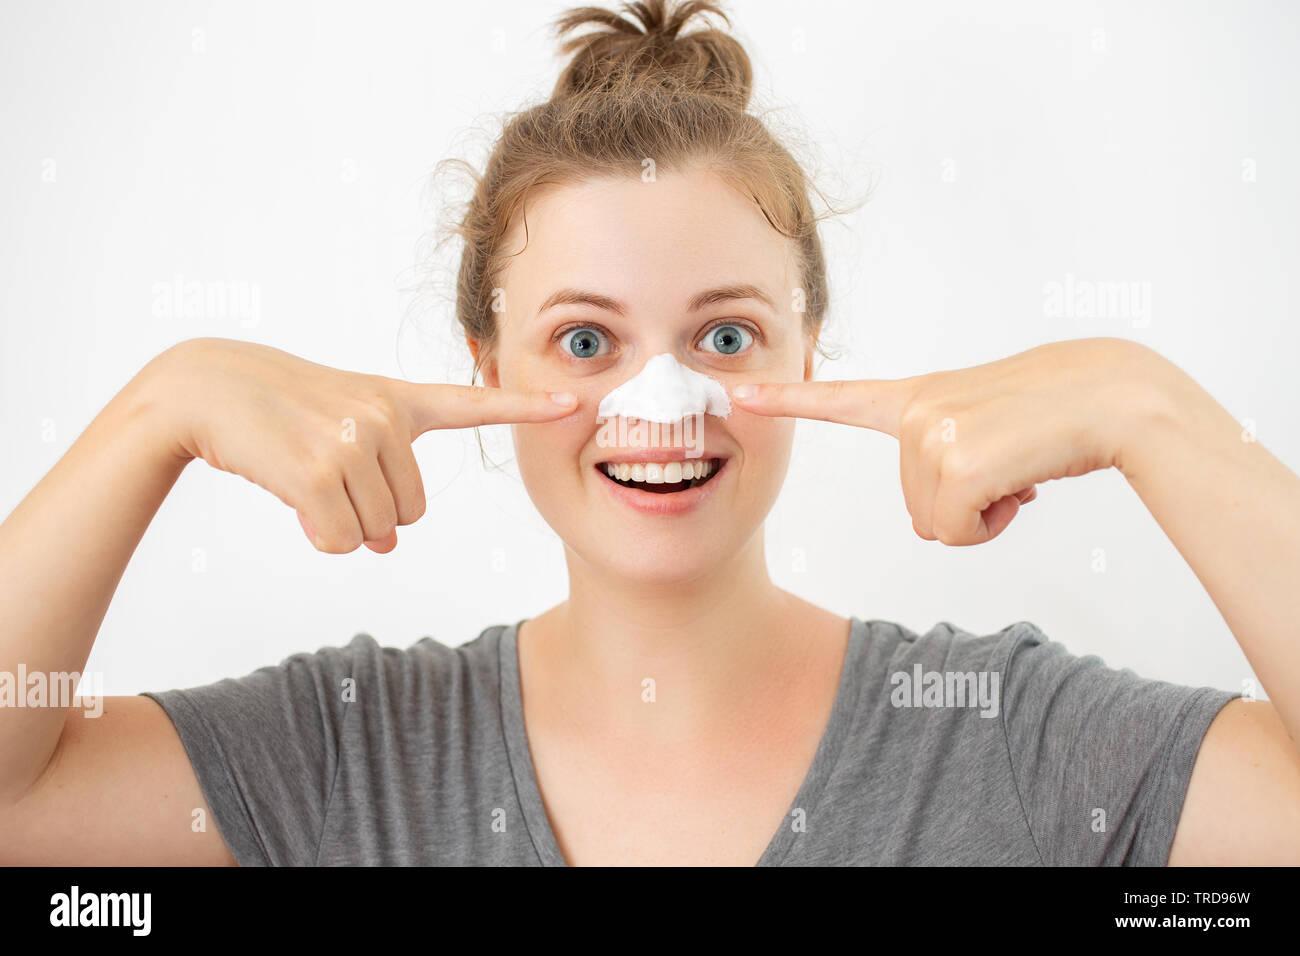 Blackhead Nose Stock Photos & Blackhead Nose Stock Images - Alamy